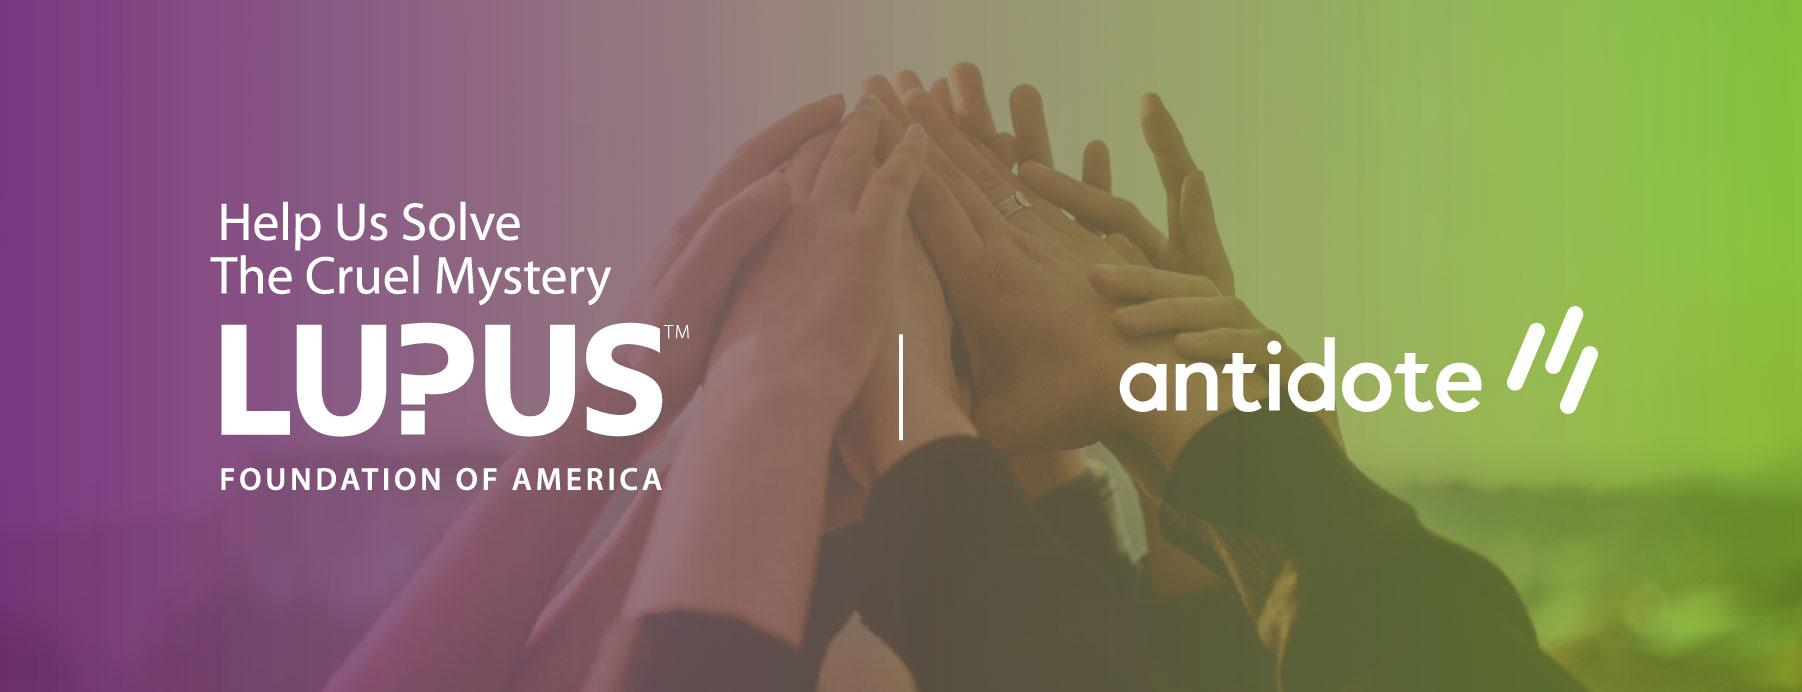 Lupus-Foundation-of-America-Partnership.jpg